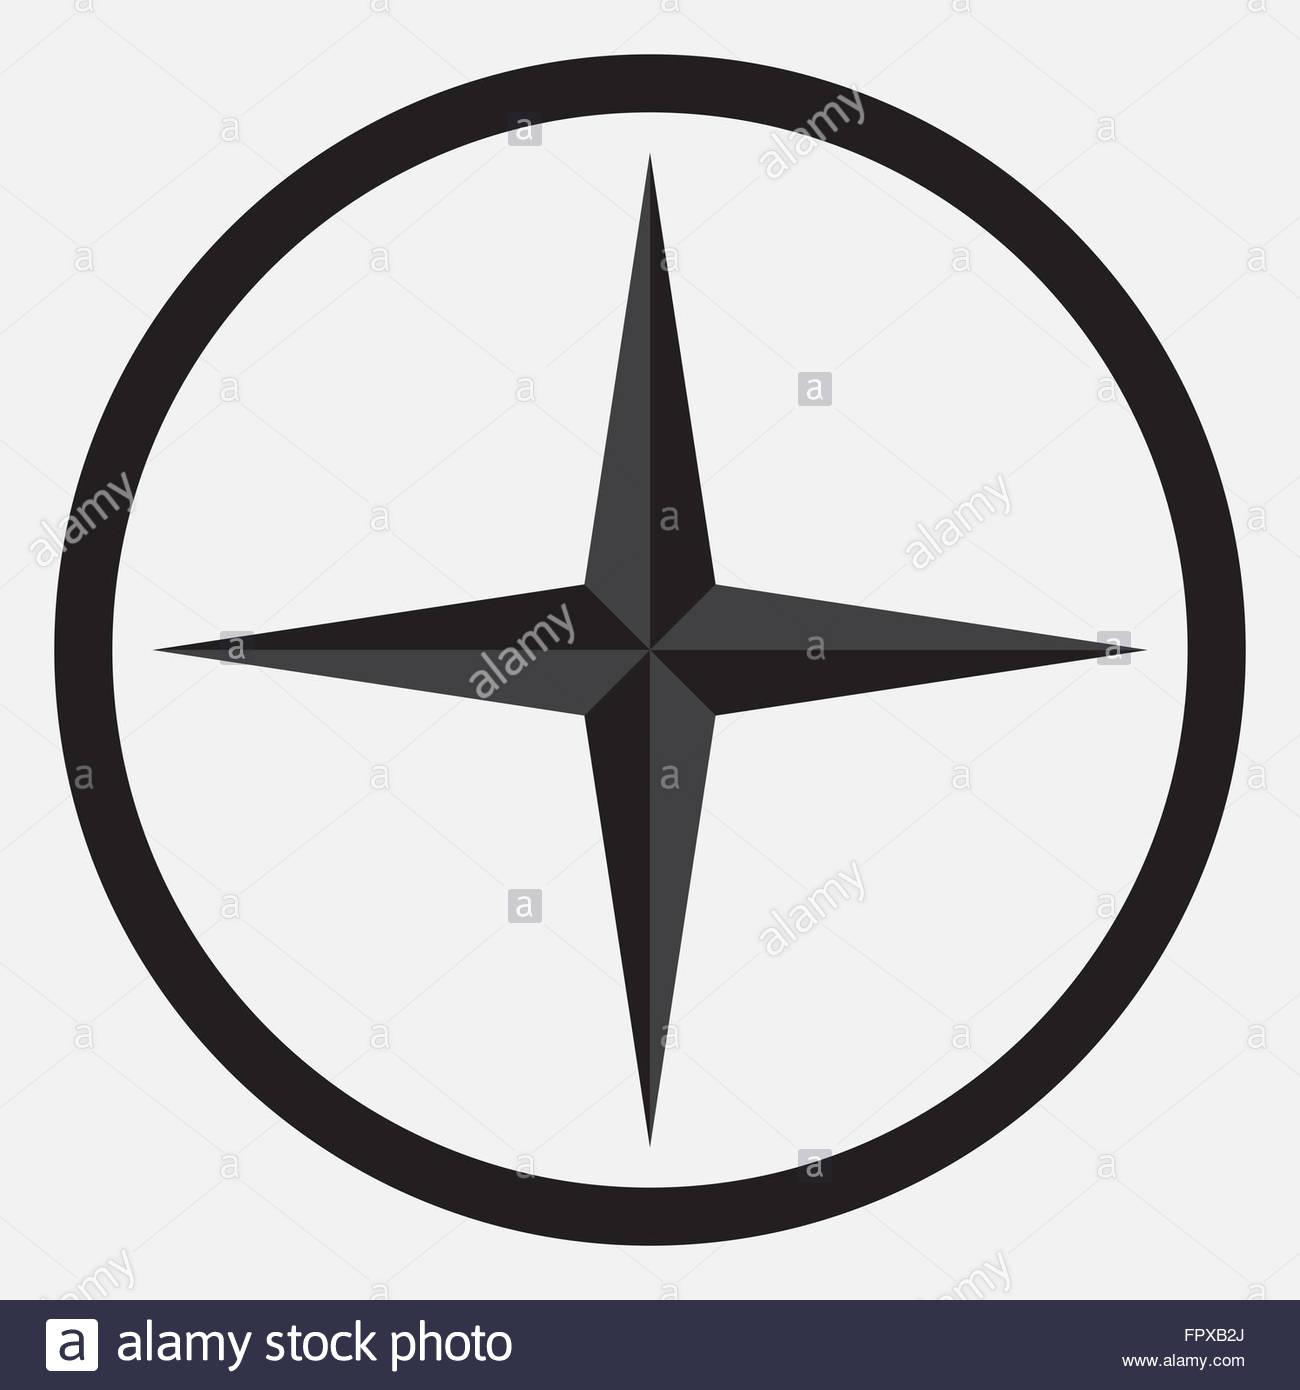 1300x1390 Compass Star Icon Monochrome Black White. Compass And Star